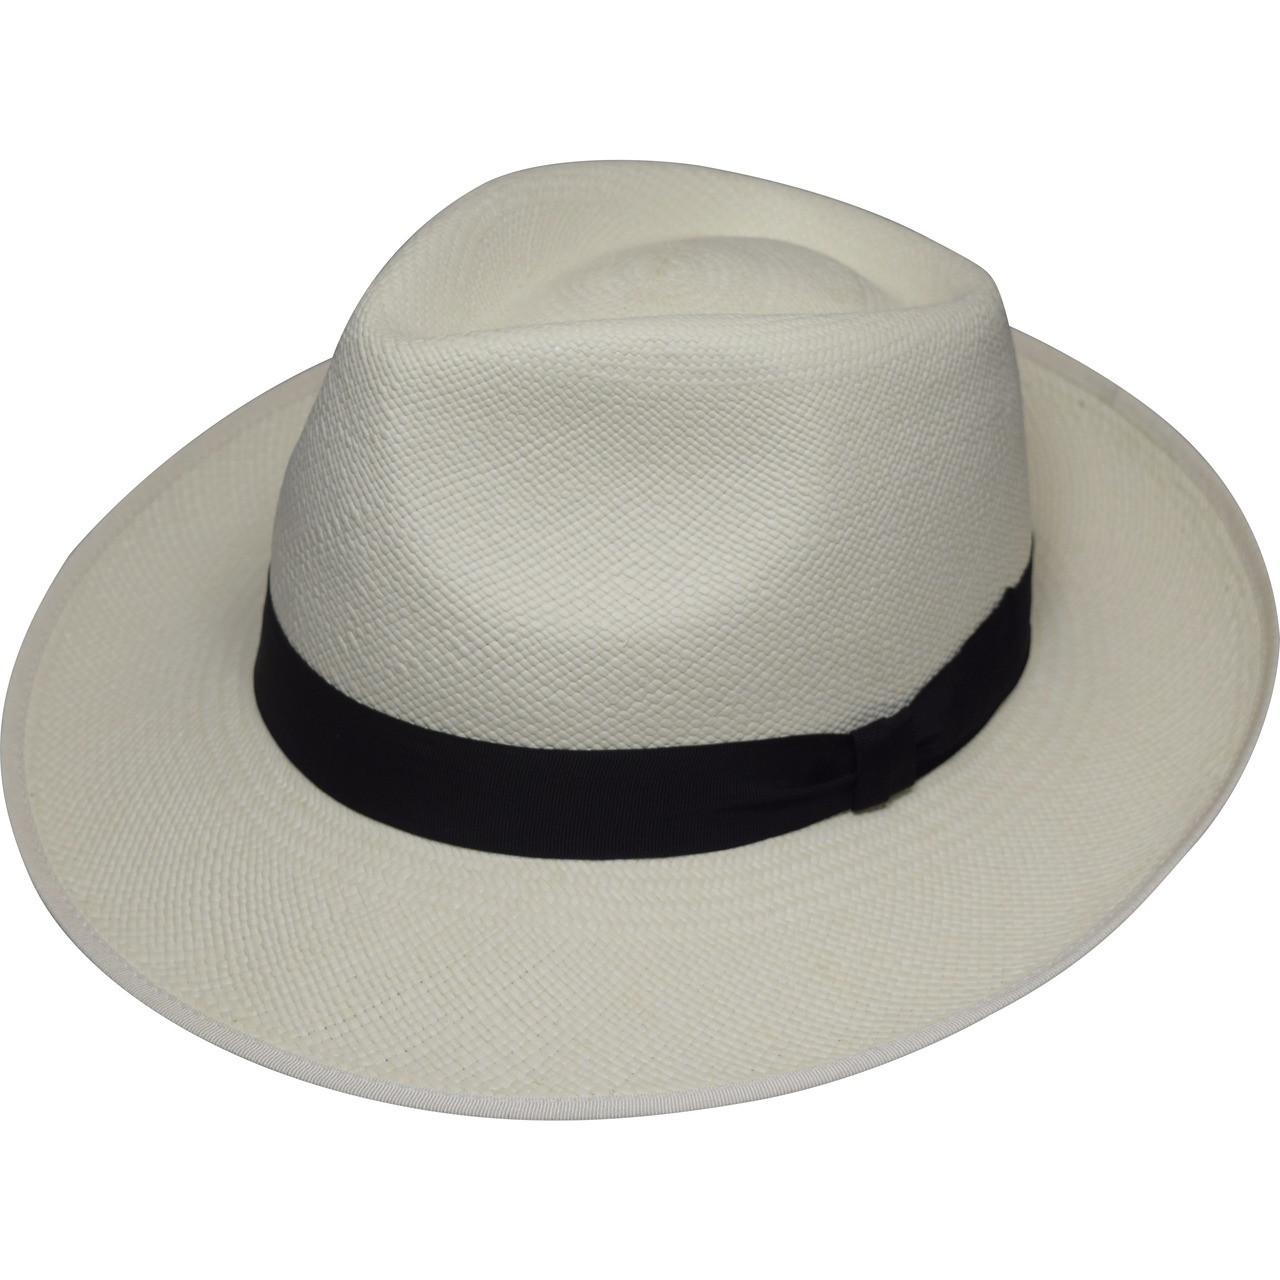 1f92a613ade566 Granada Trilby Panama Hat - Brisa - The Panama Hat Company